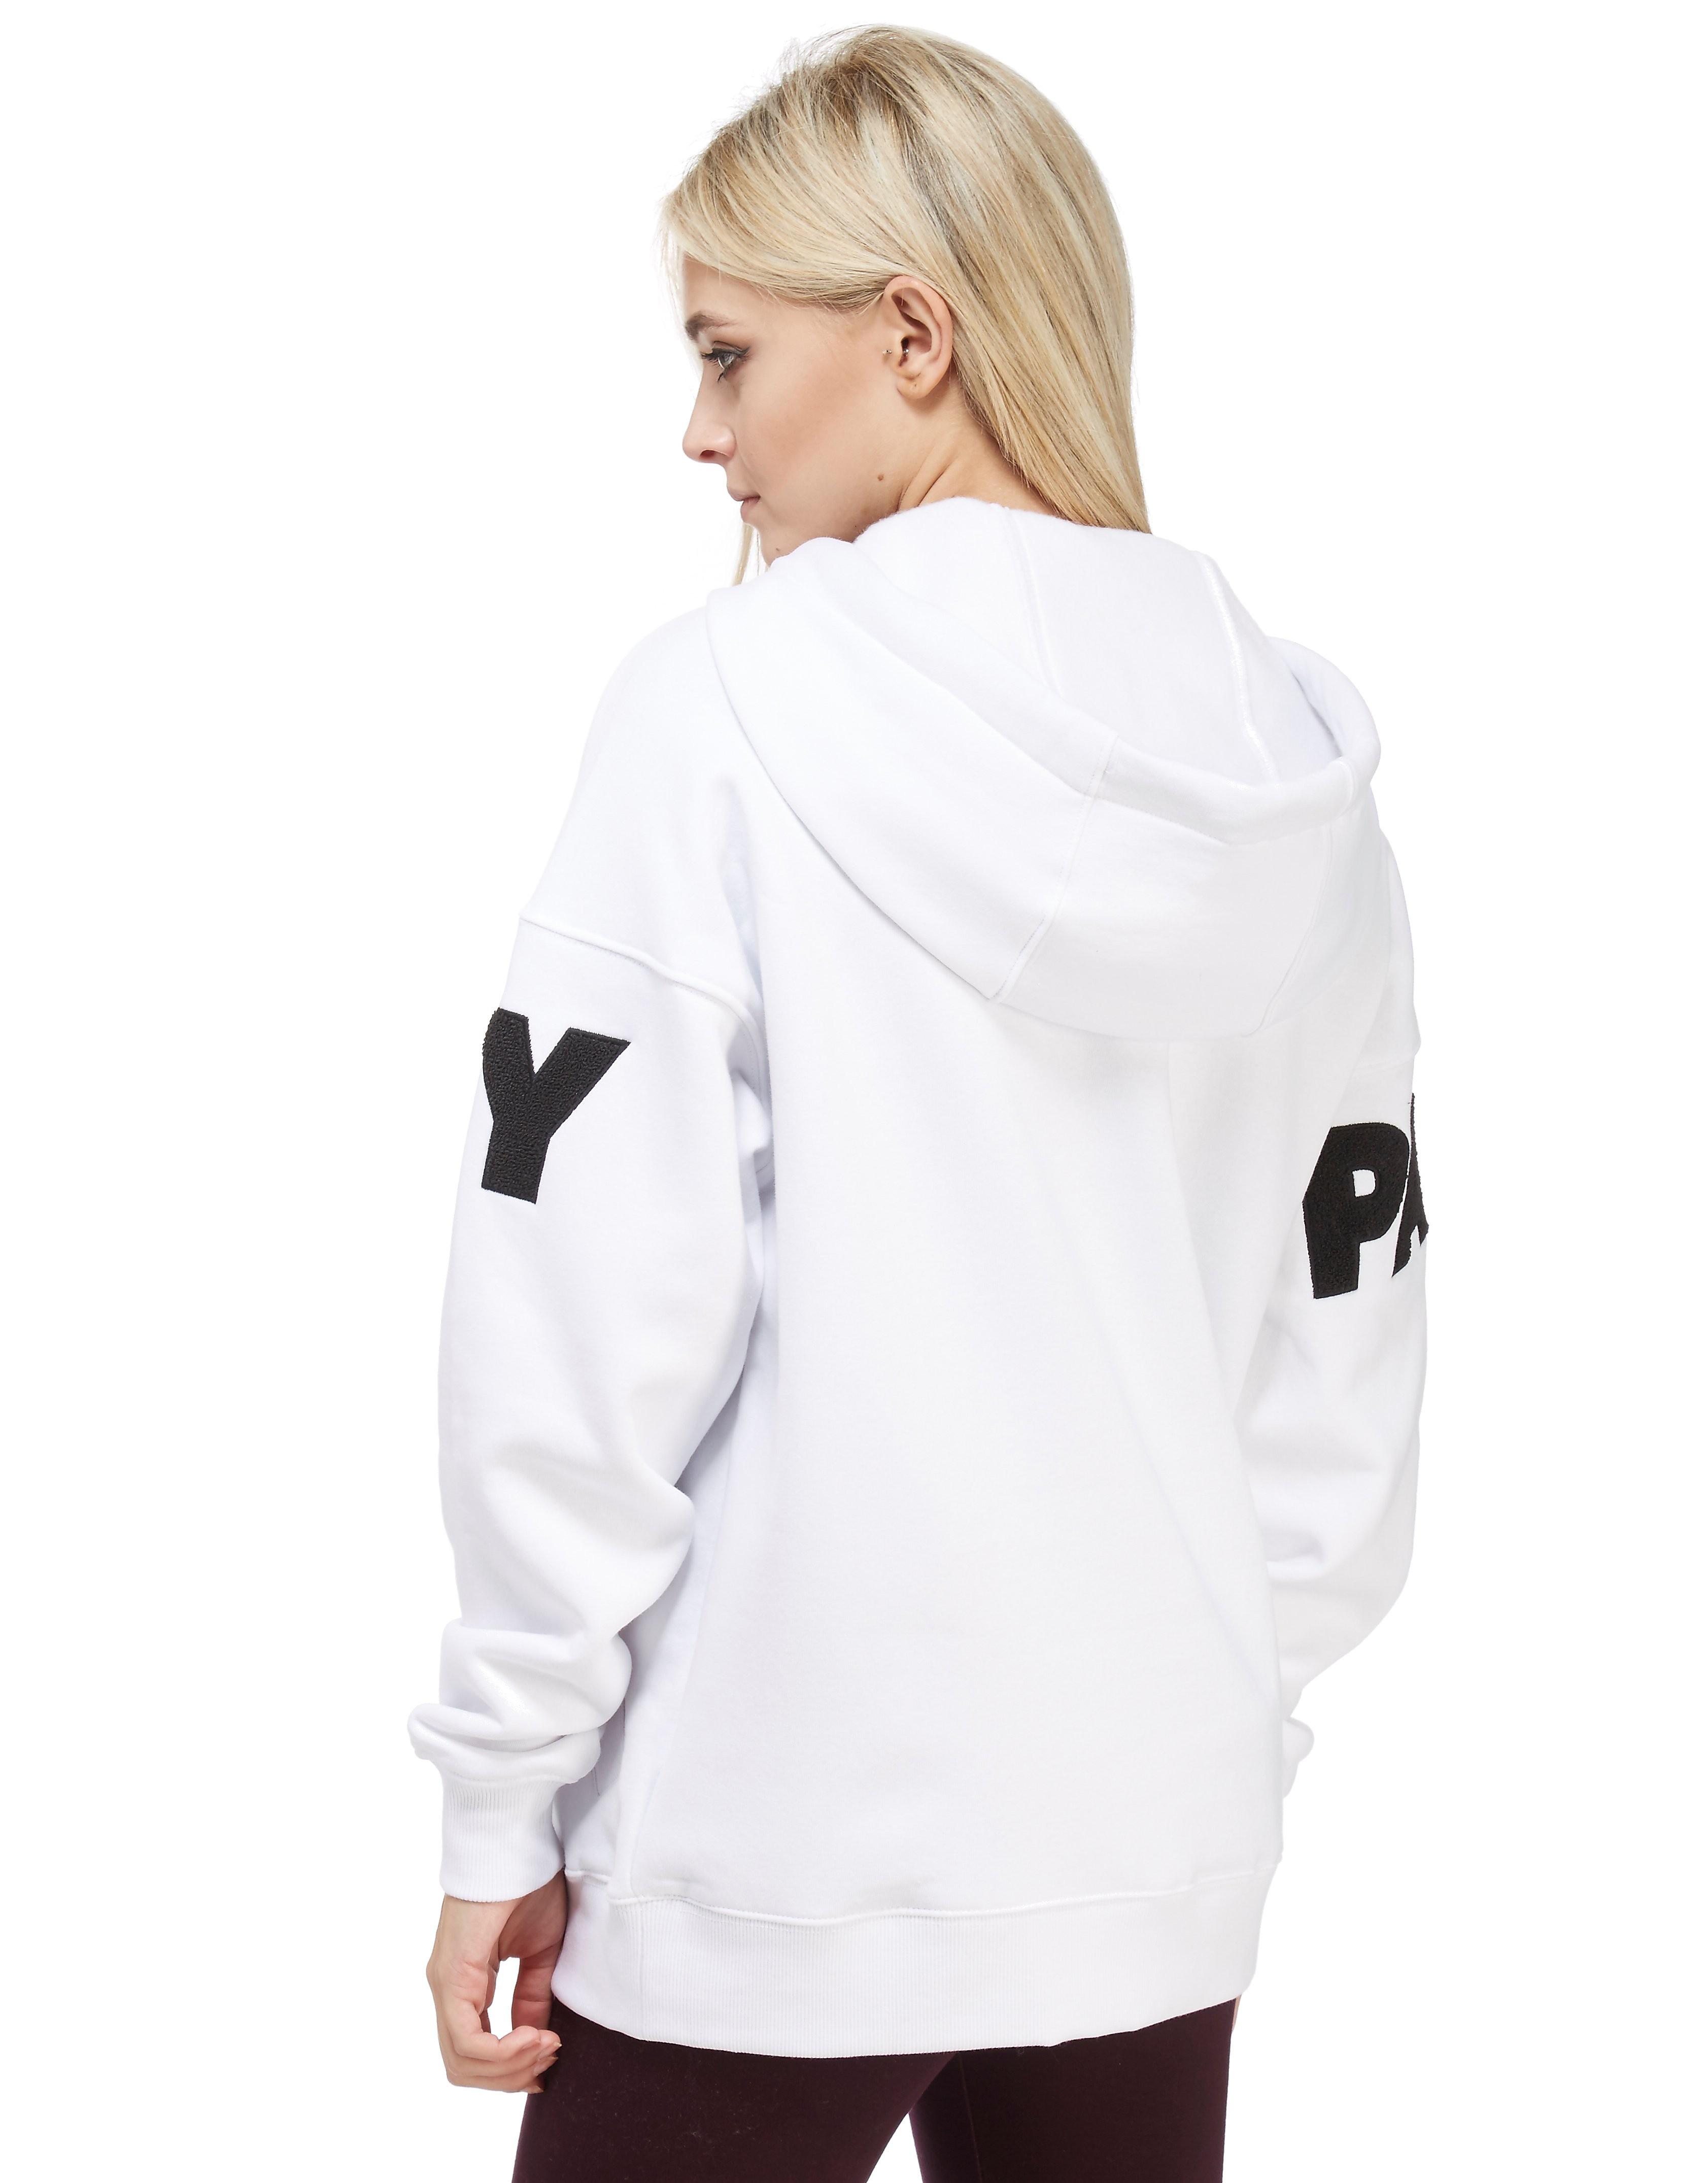 IVY PARK Oversize Hoody